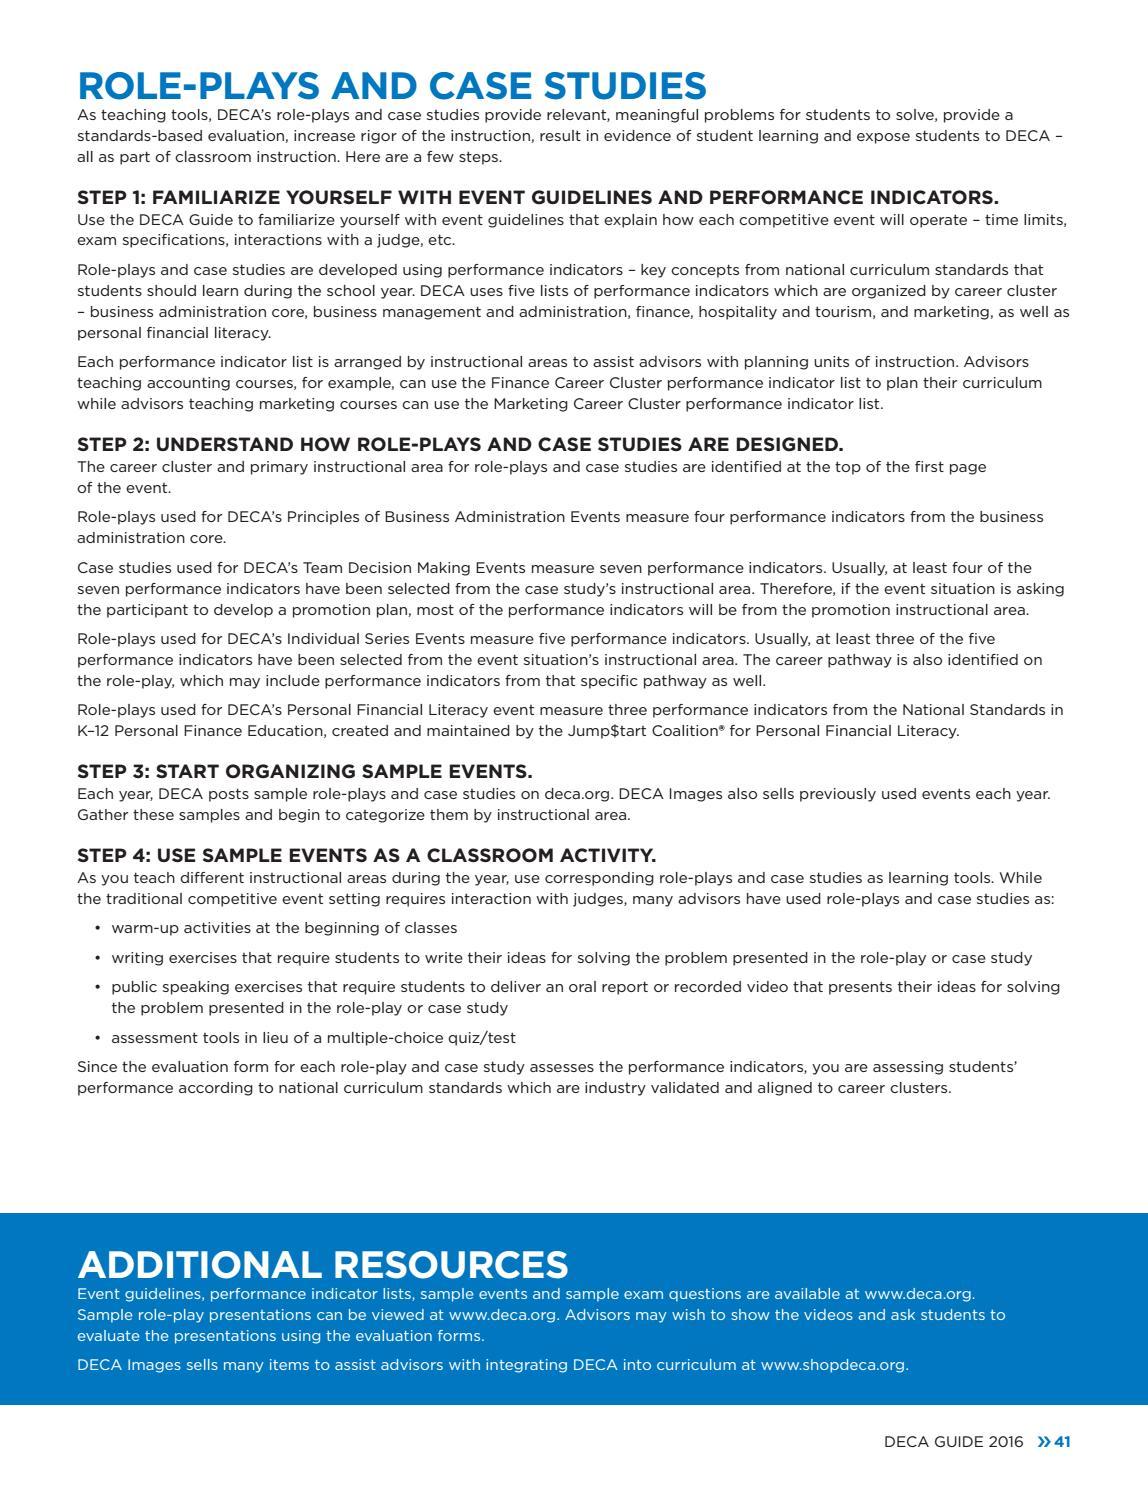 Management Case Studies and Articles